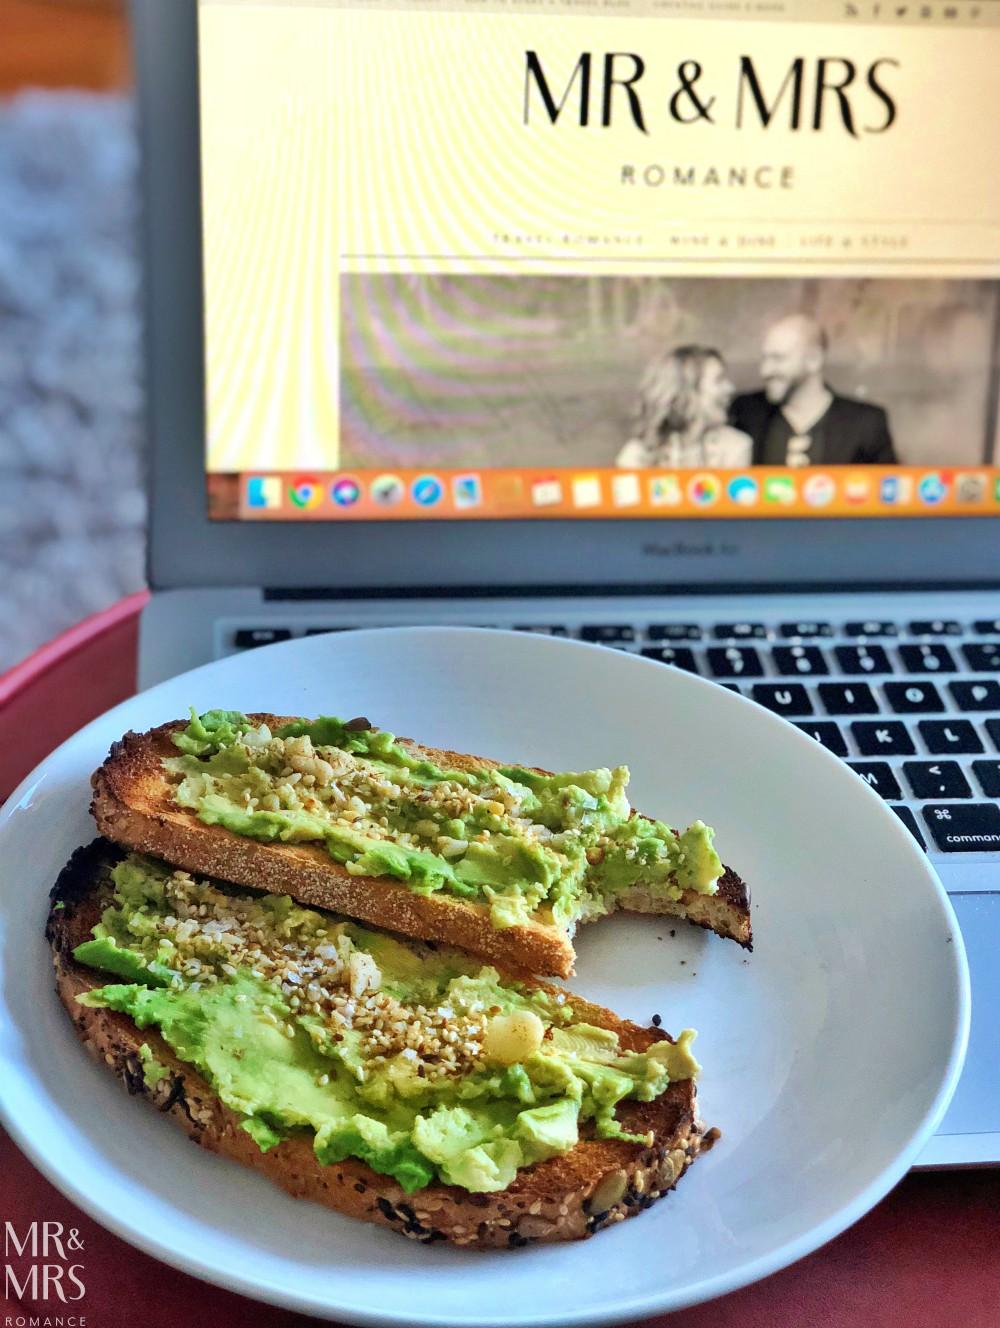 Mr & Mrs Romance - avocado toast